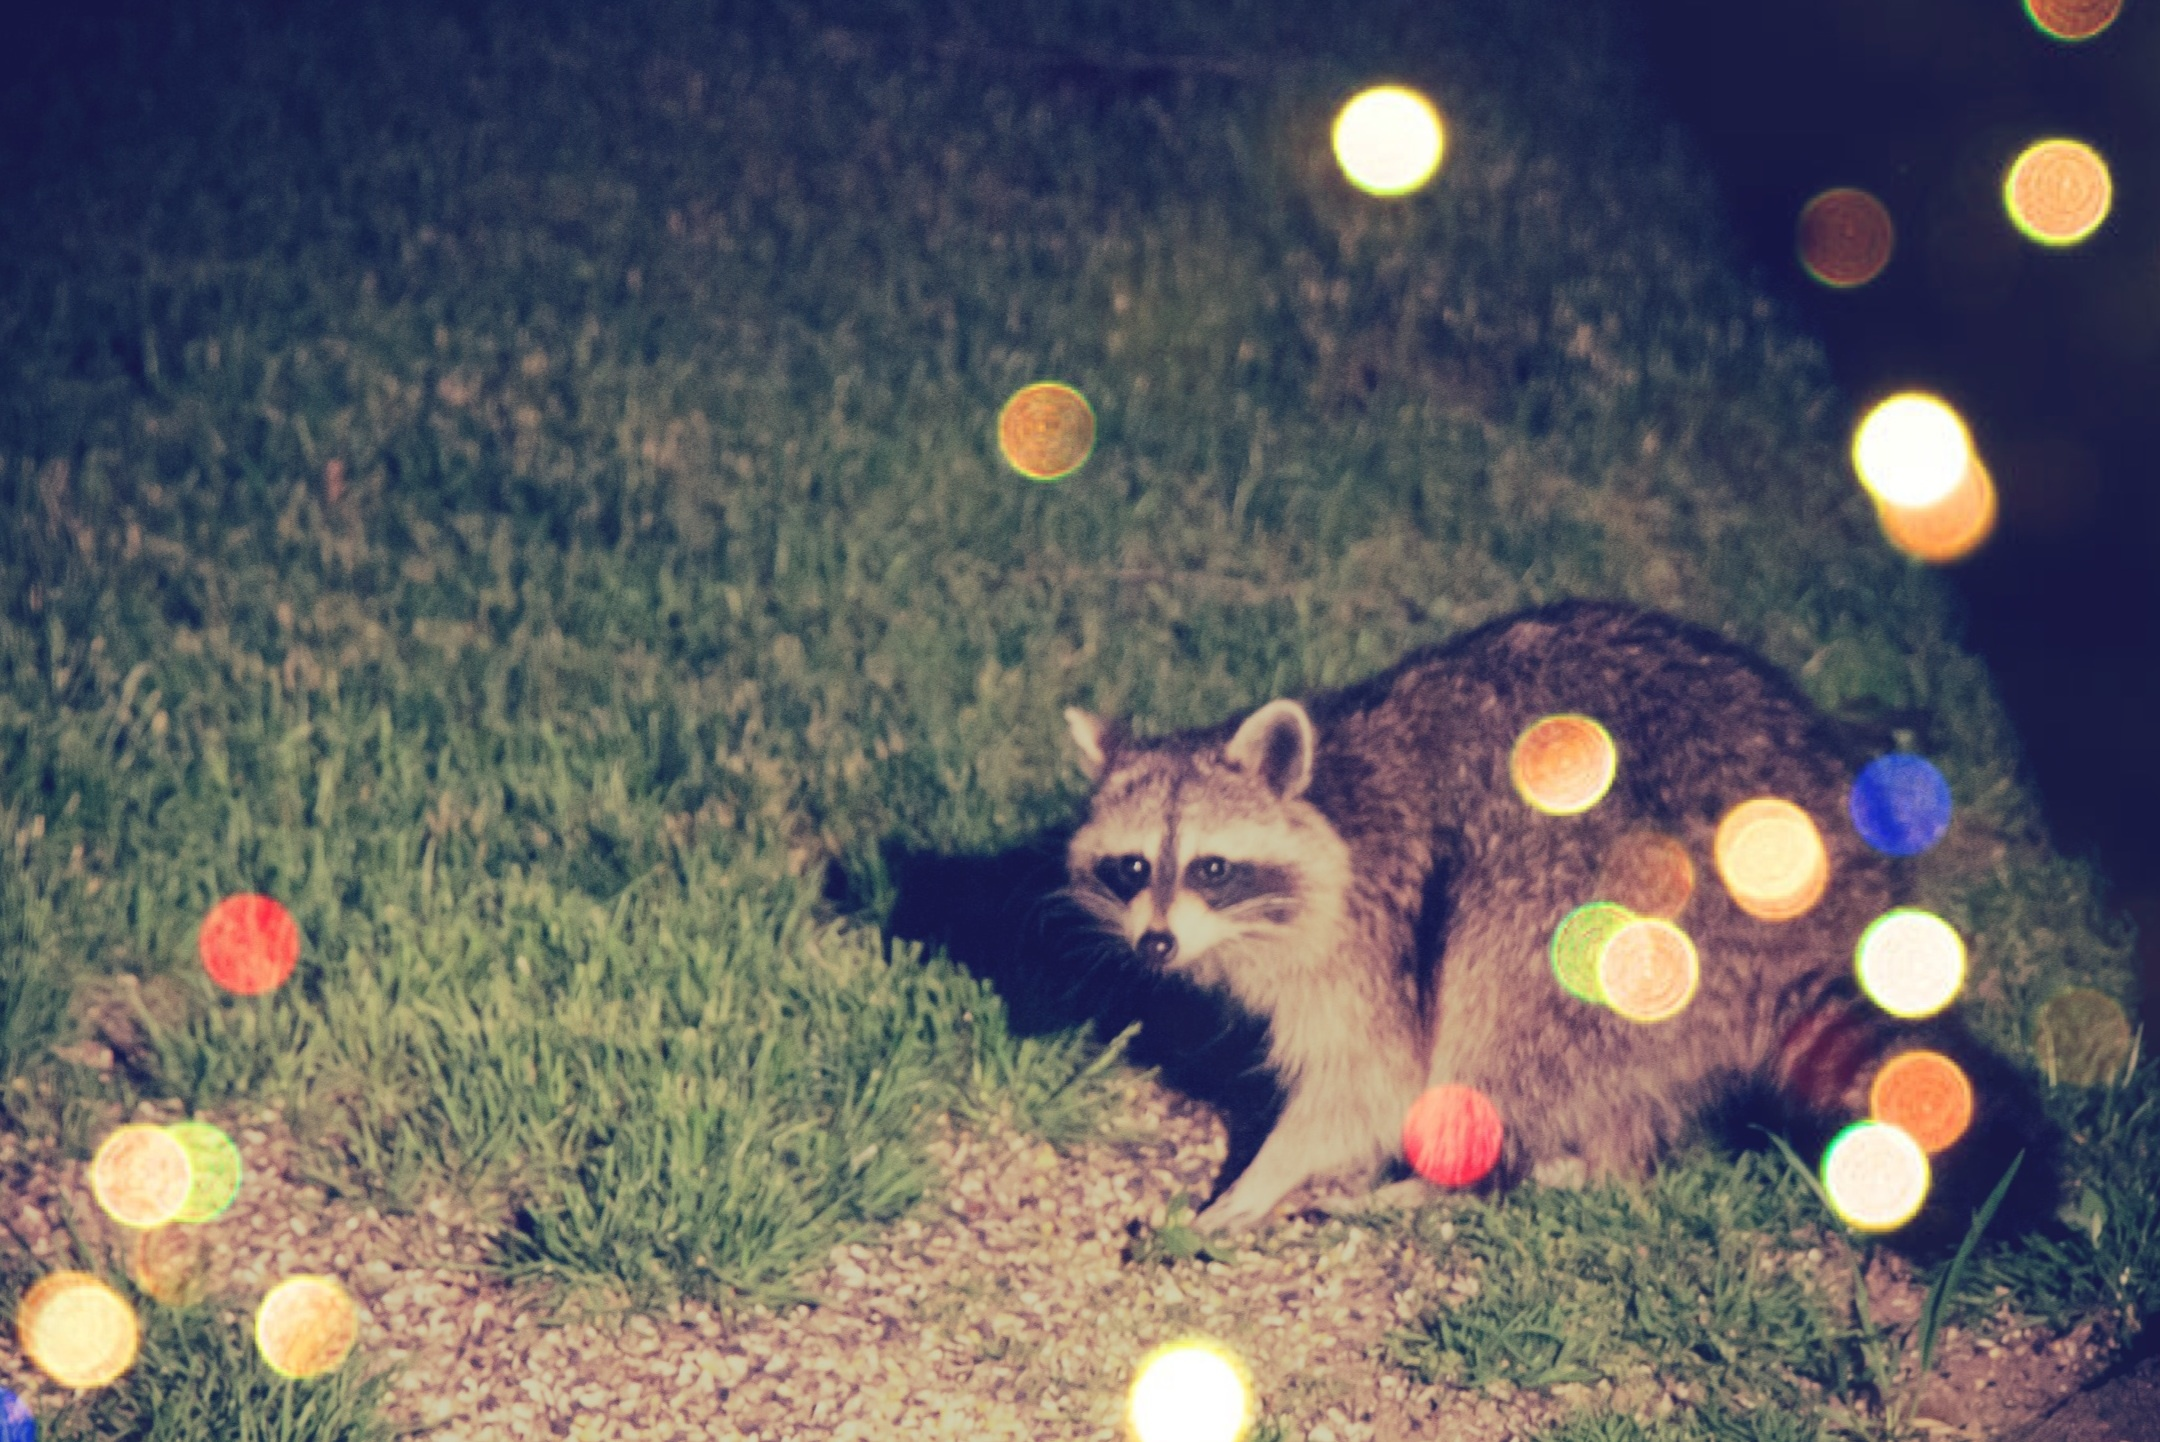 party-raccoon.JPG